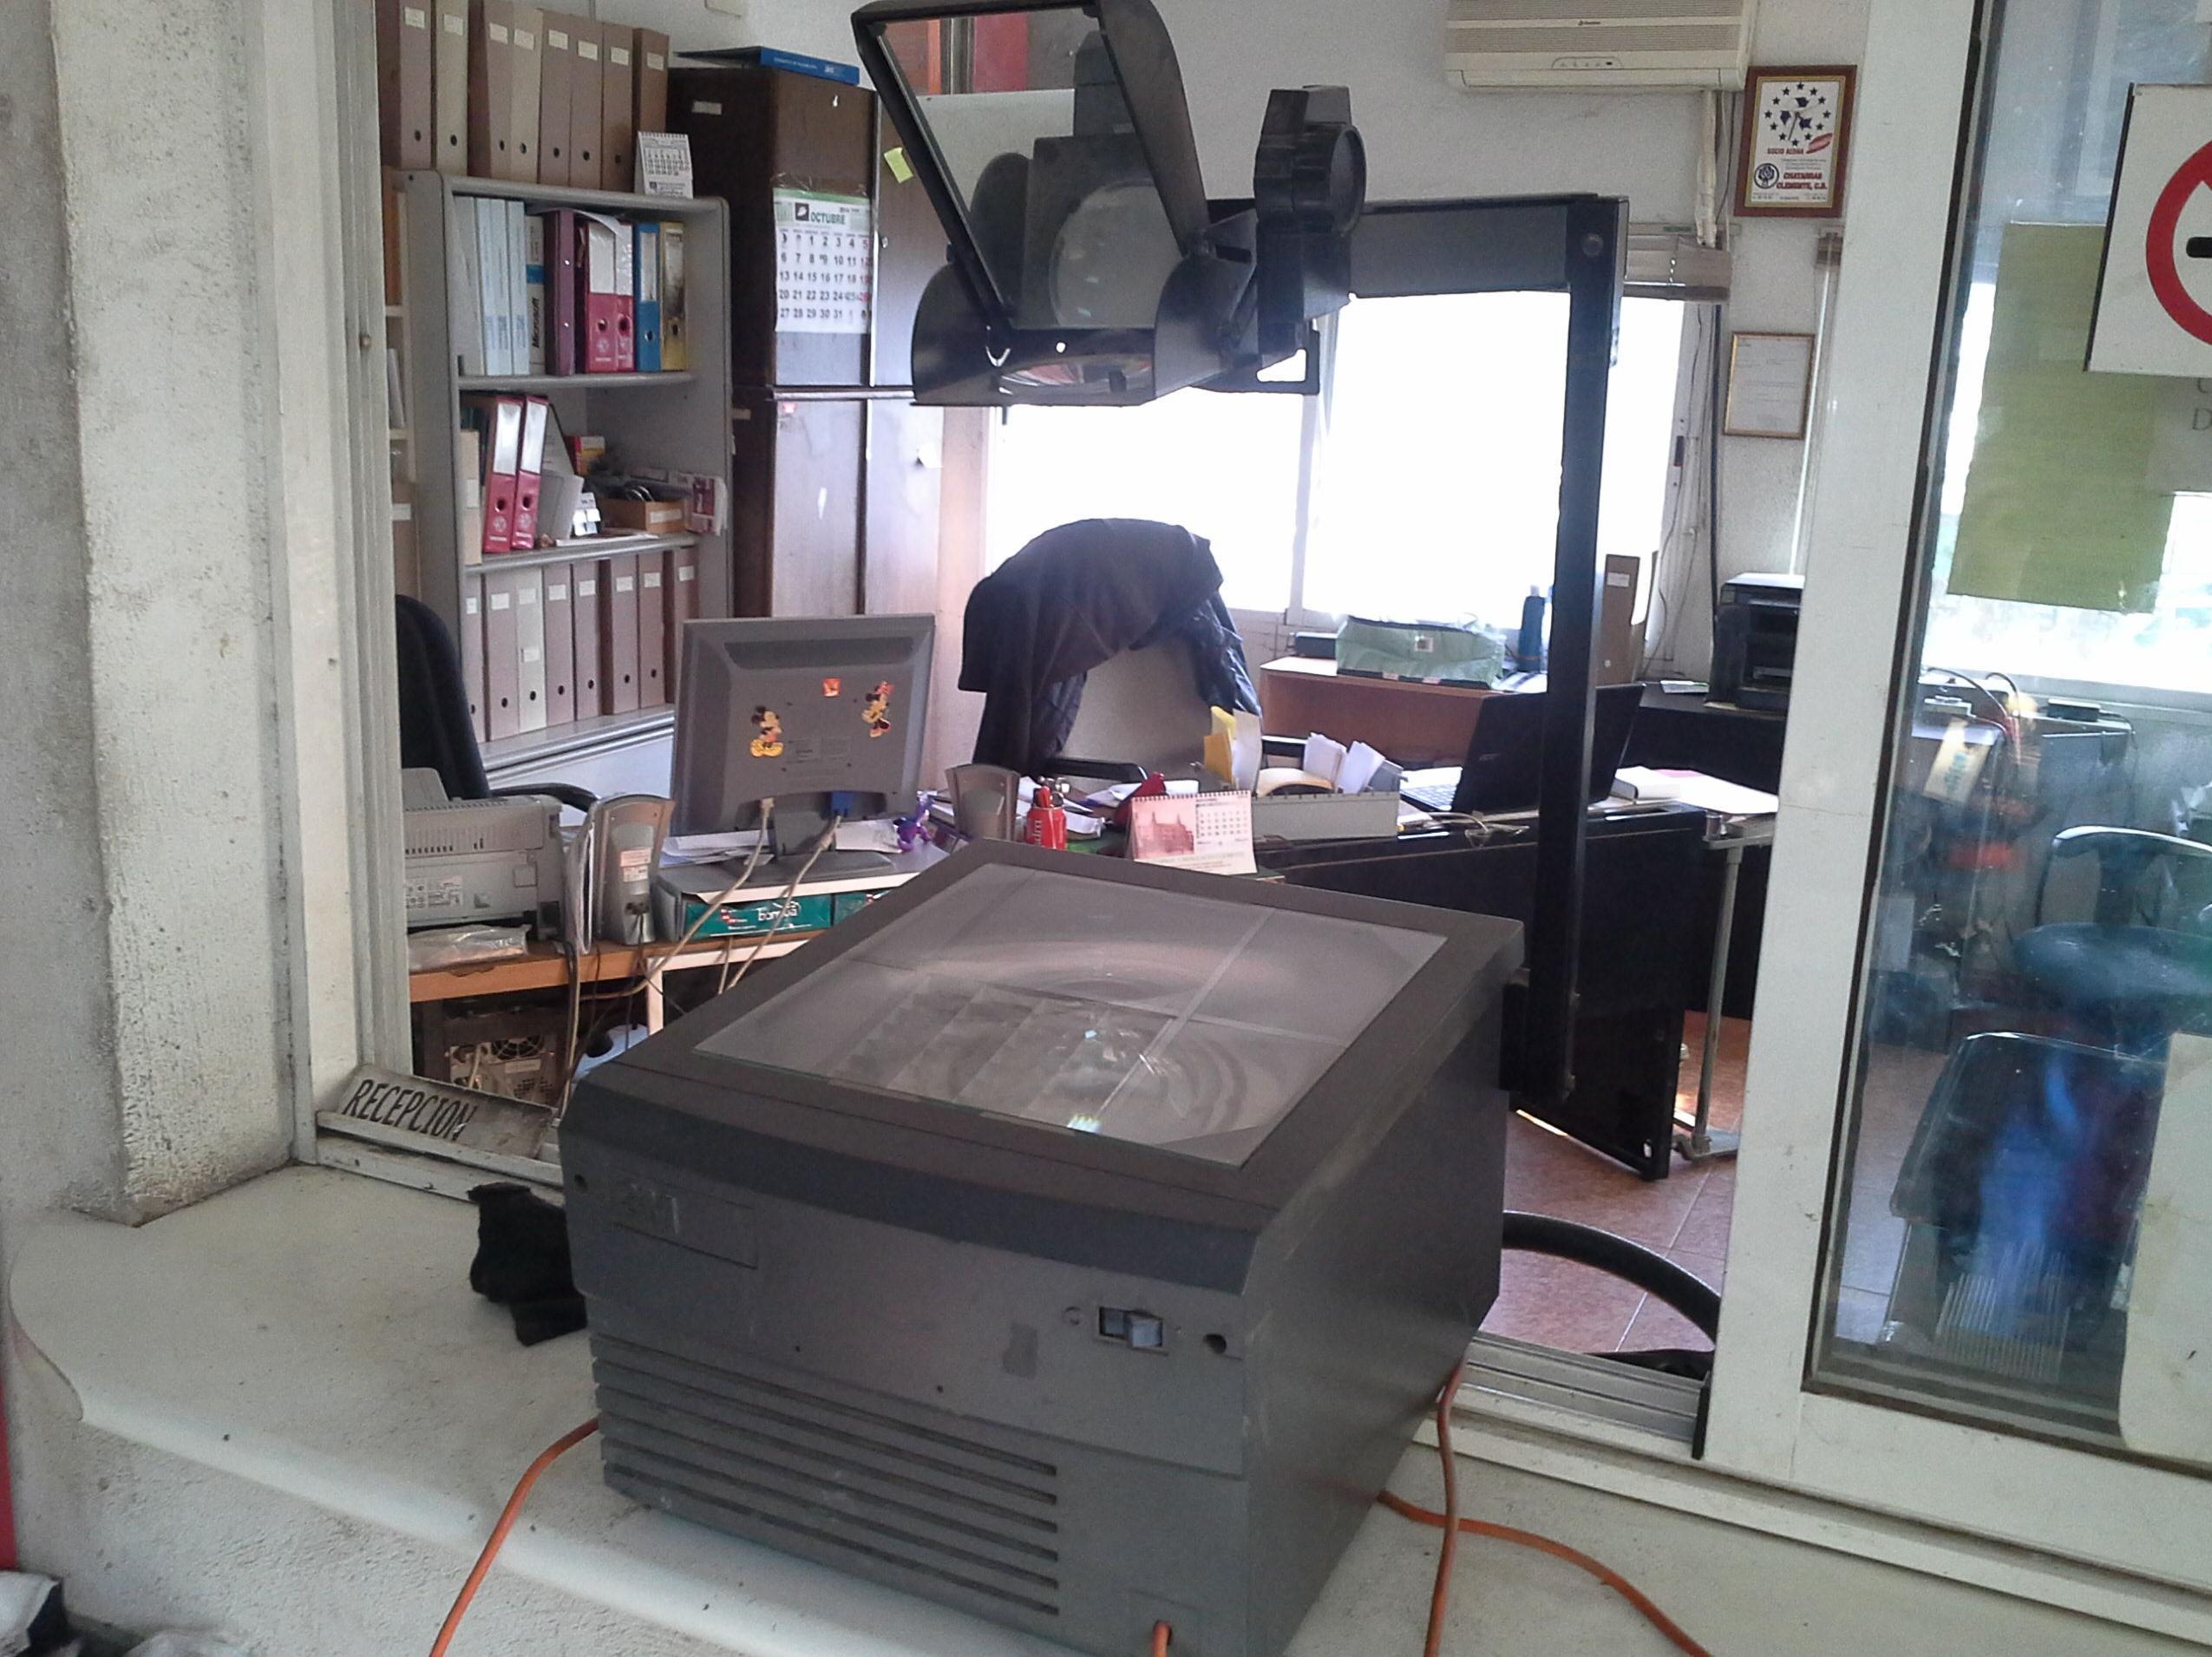 proyector de transparencias en Chatarras Clemente de Albacete